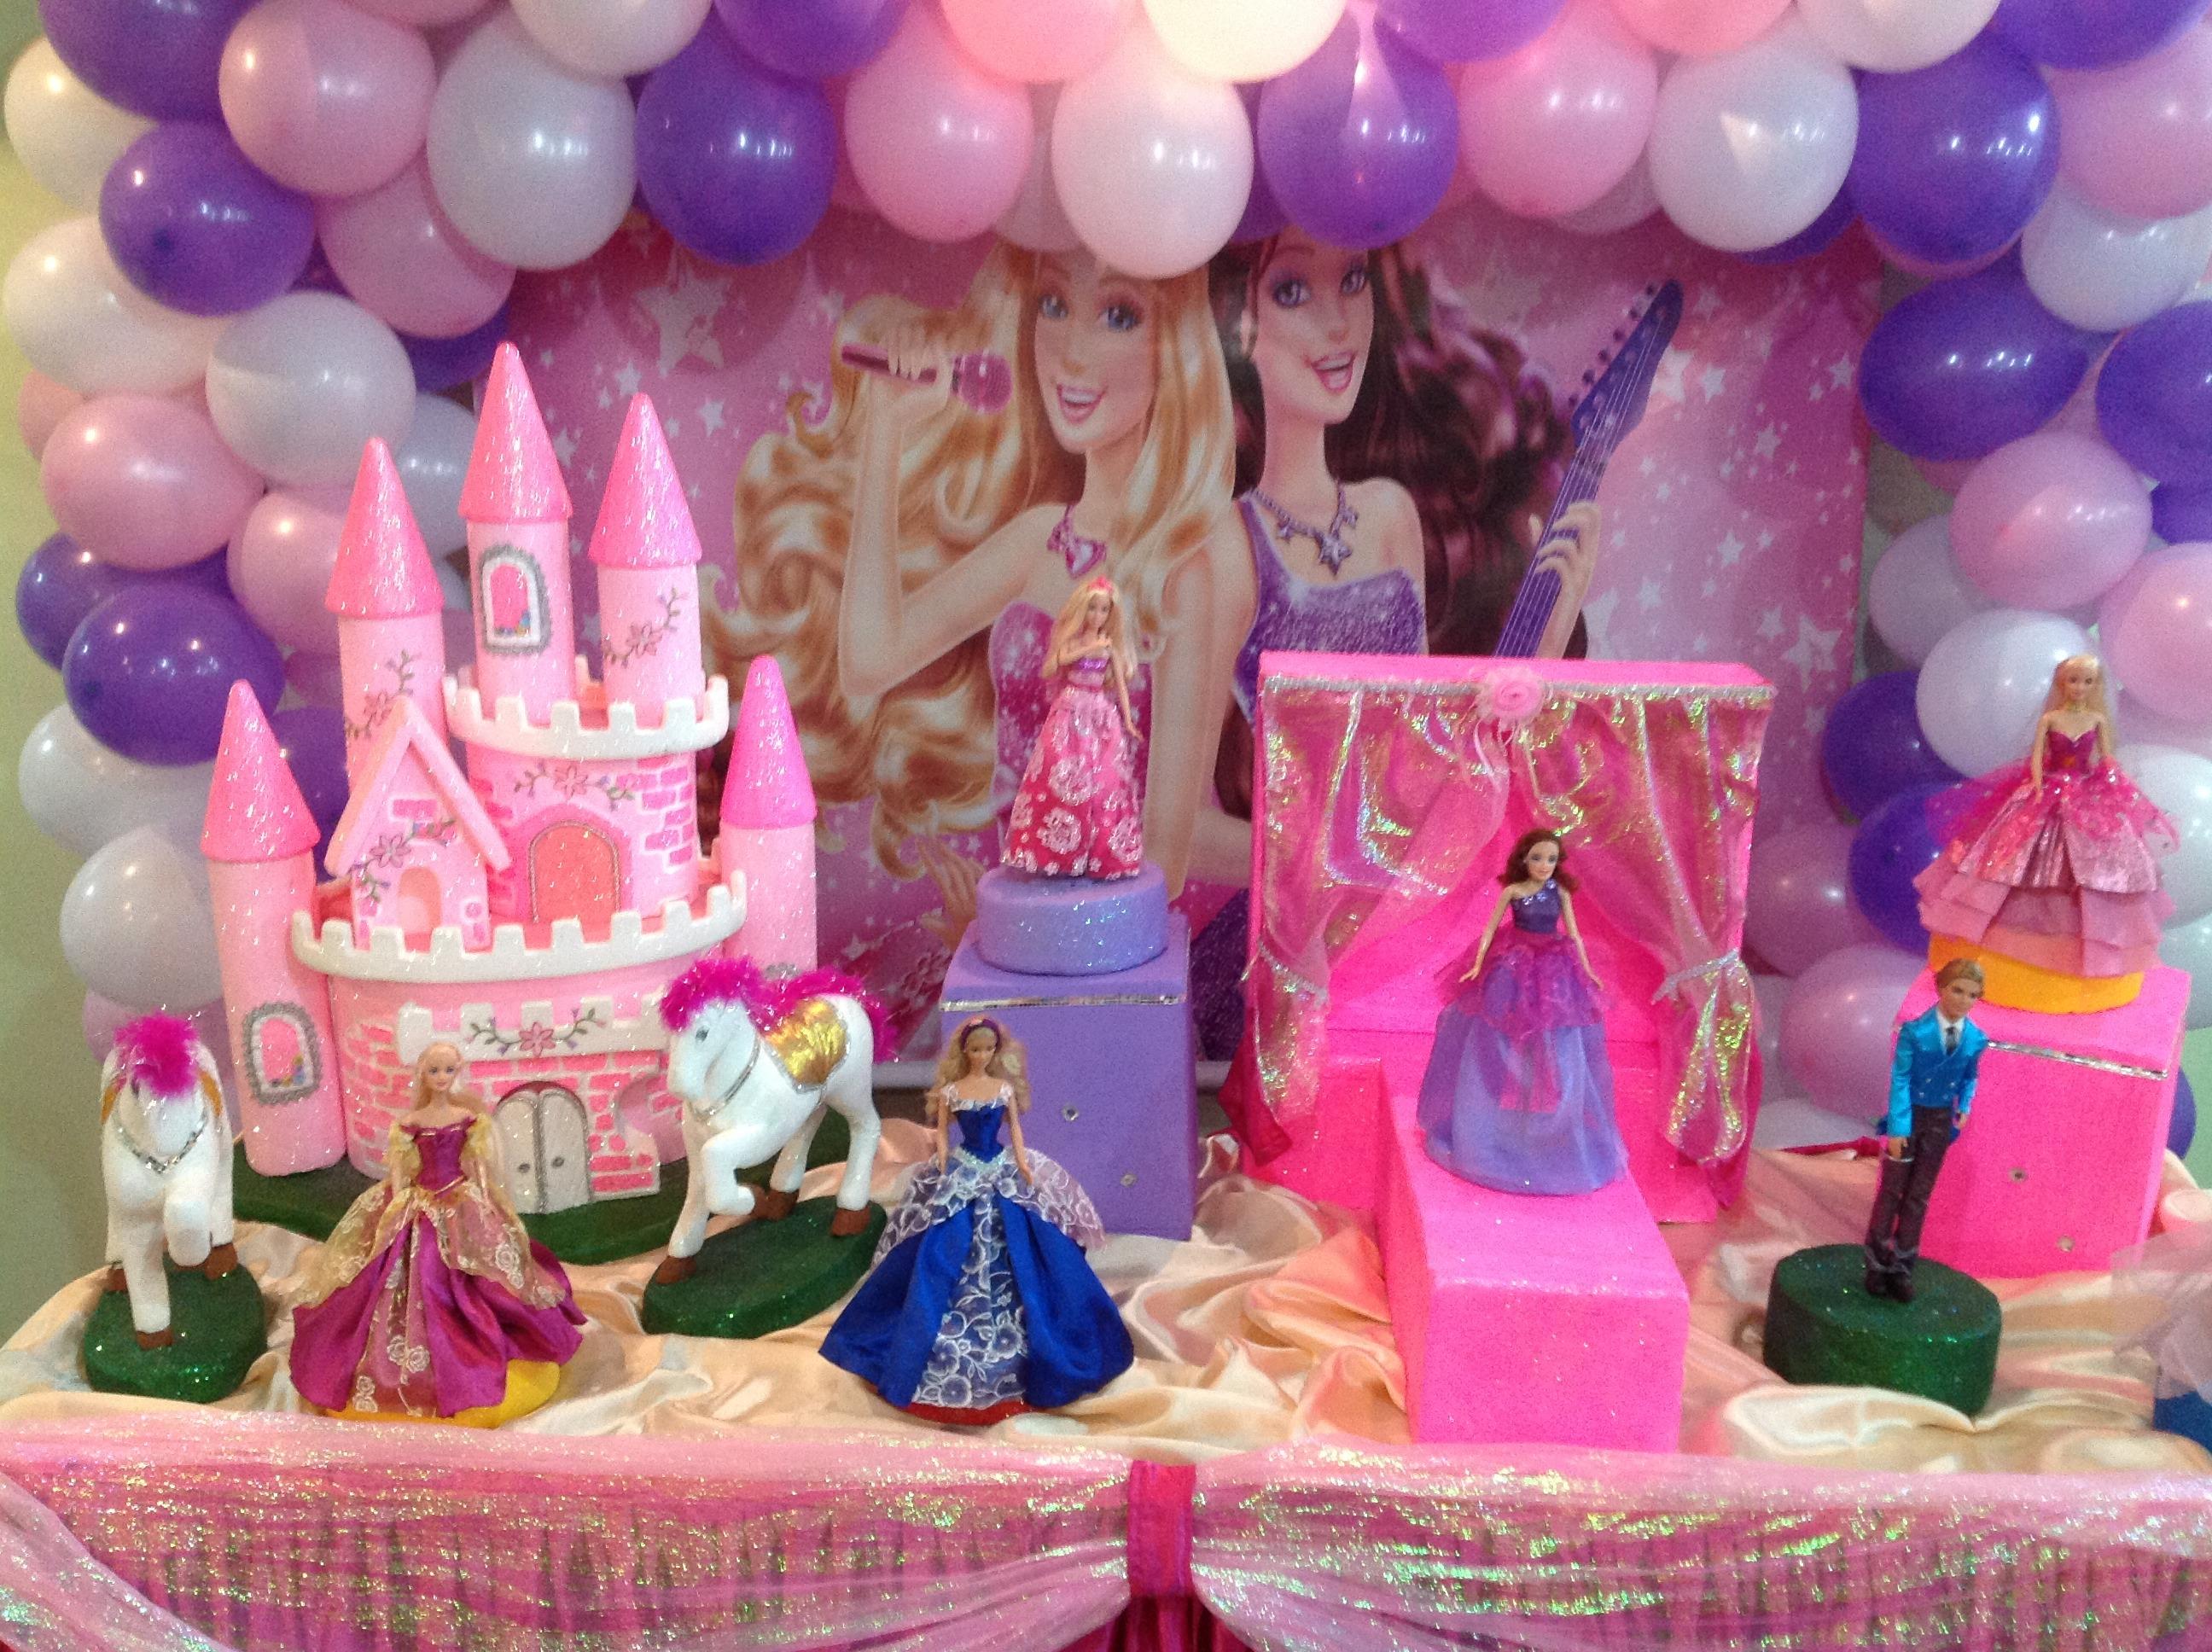 decoracao festa barbie: pop star decoracao barbie decoracao barbie pop star decoracao de festa